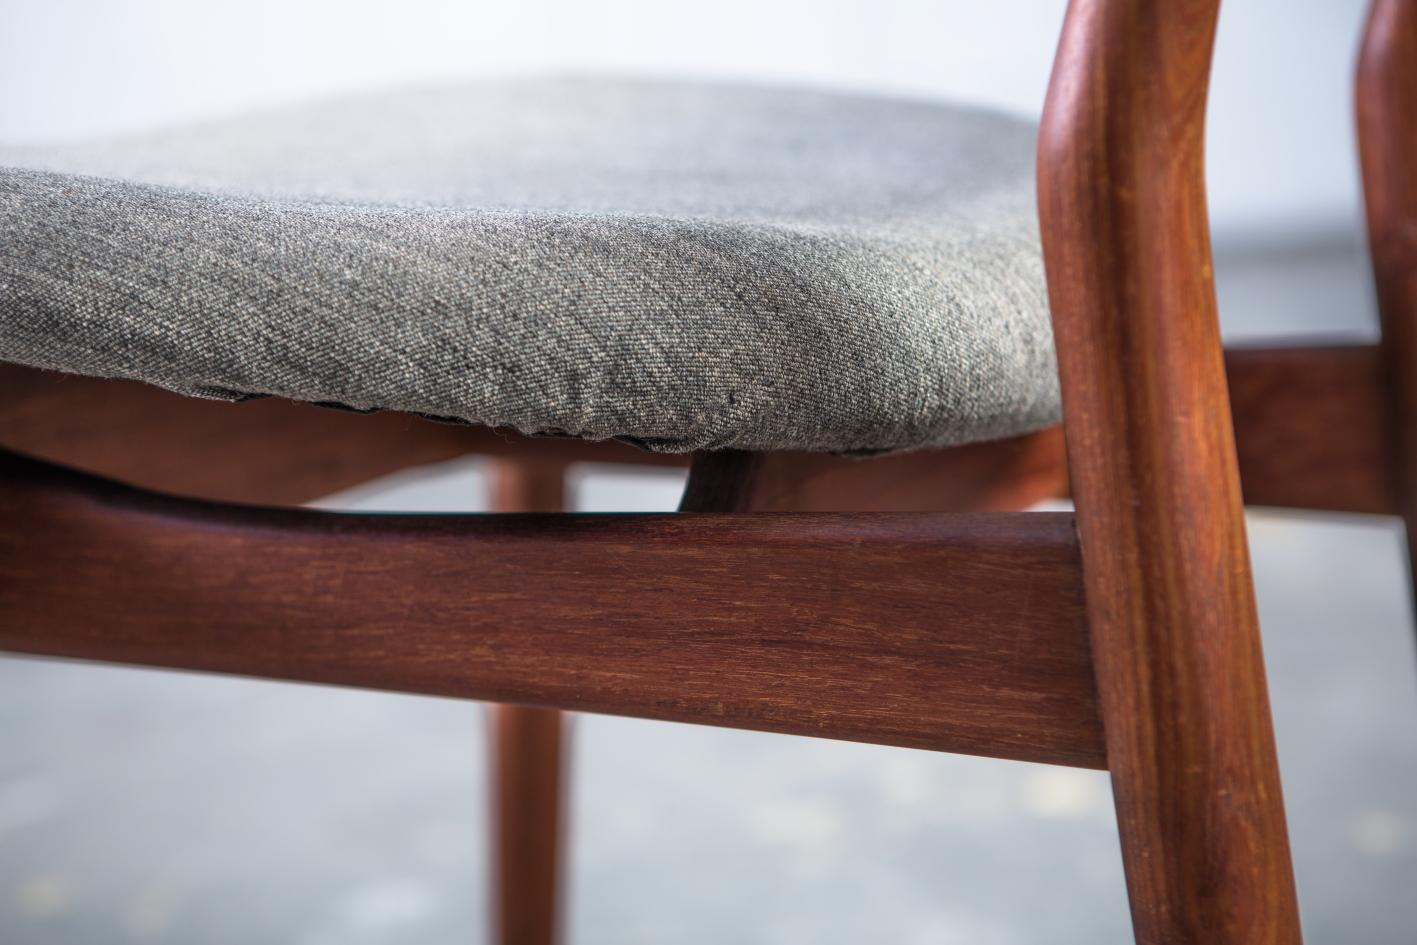 NV108 - Fj55 chairs - Finn Juhl for Niels Vodder - Seat fabric detail